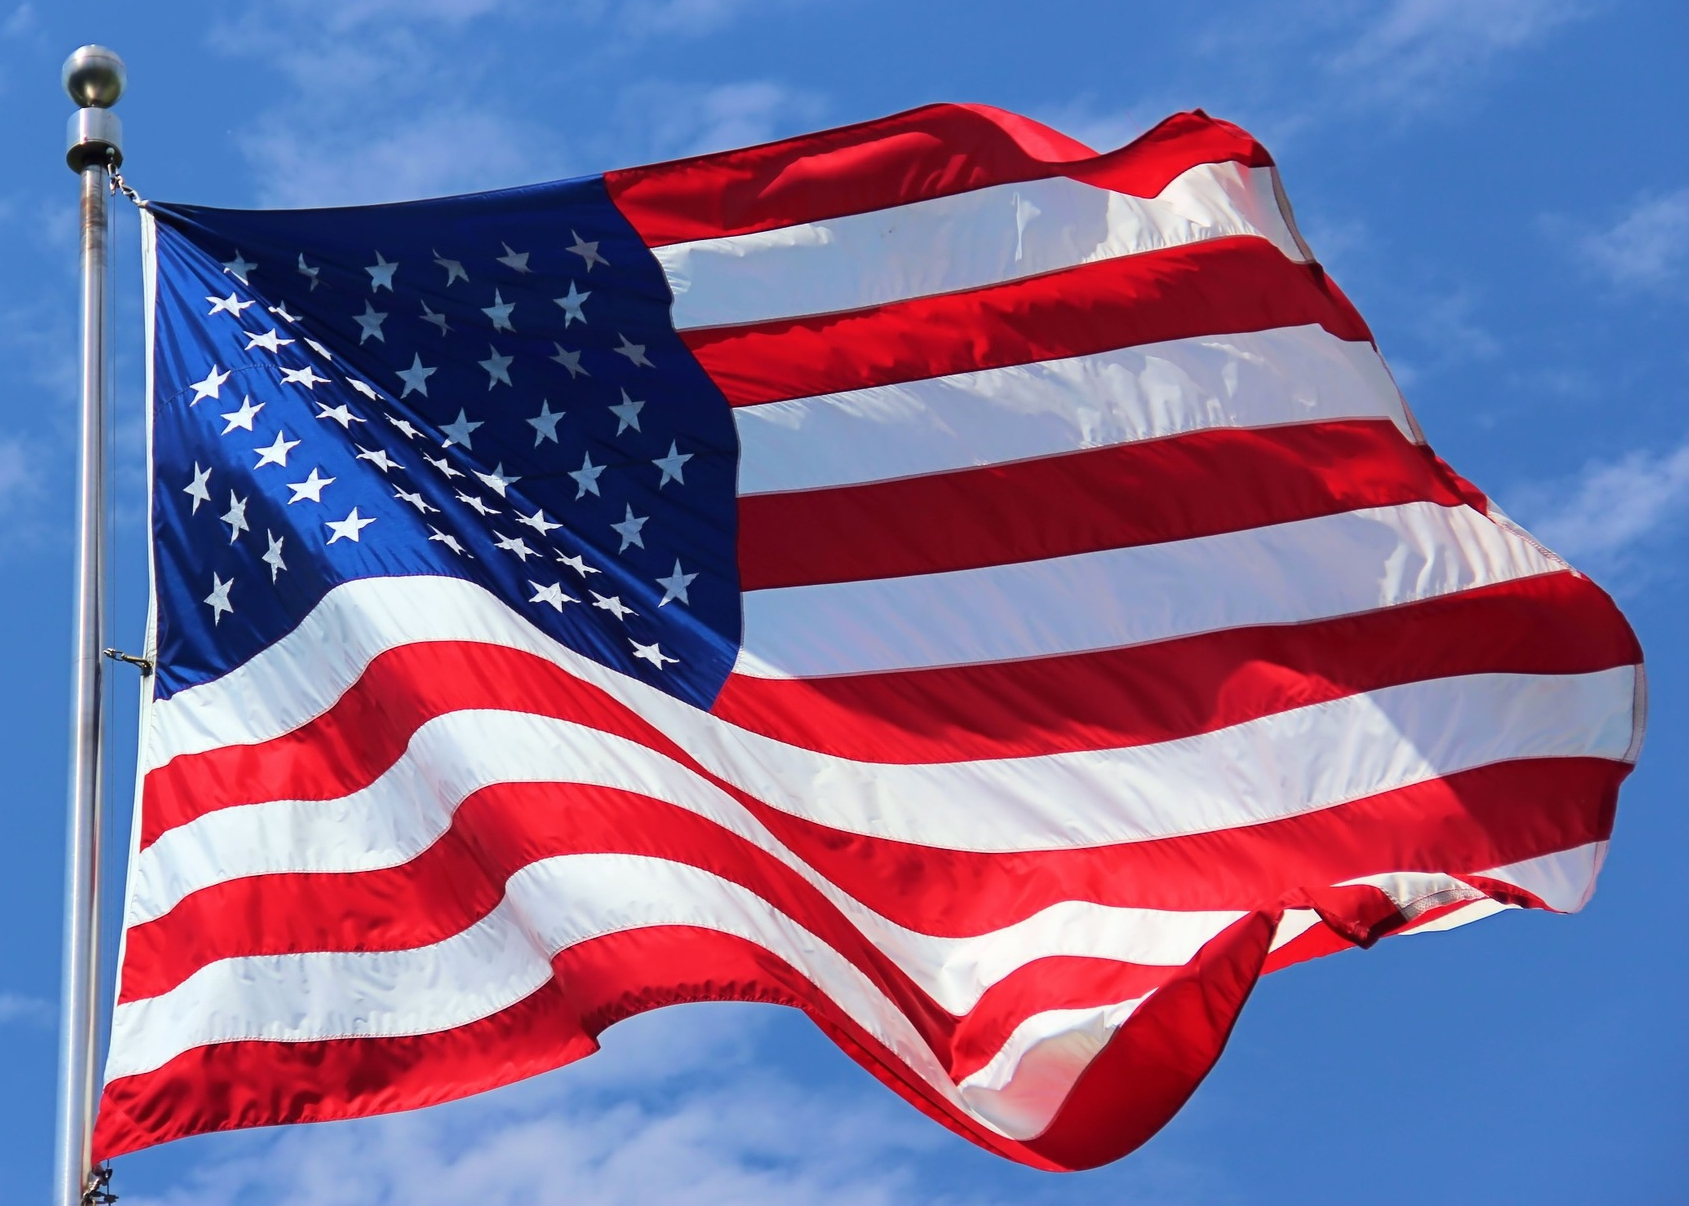 U S Flag Code American Flag Etiquette Rules And